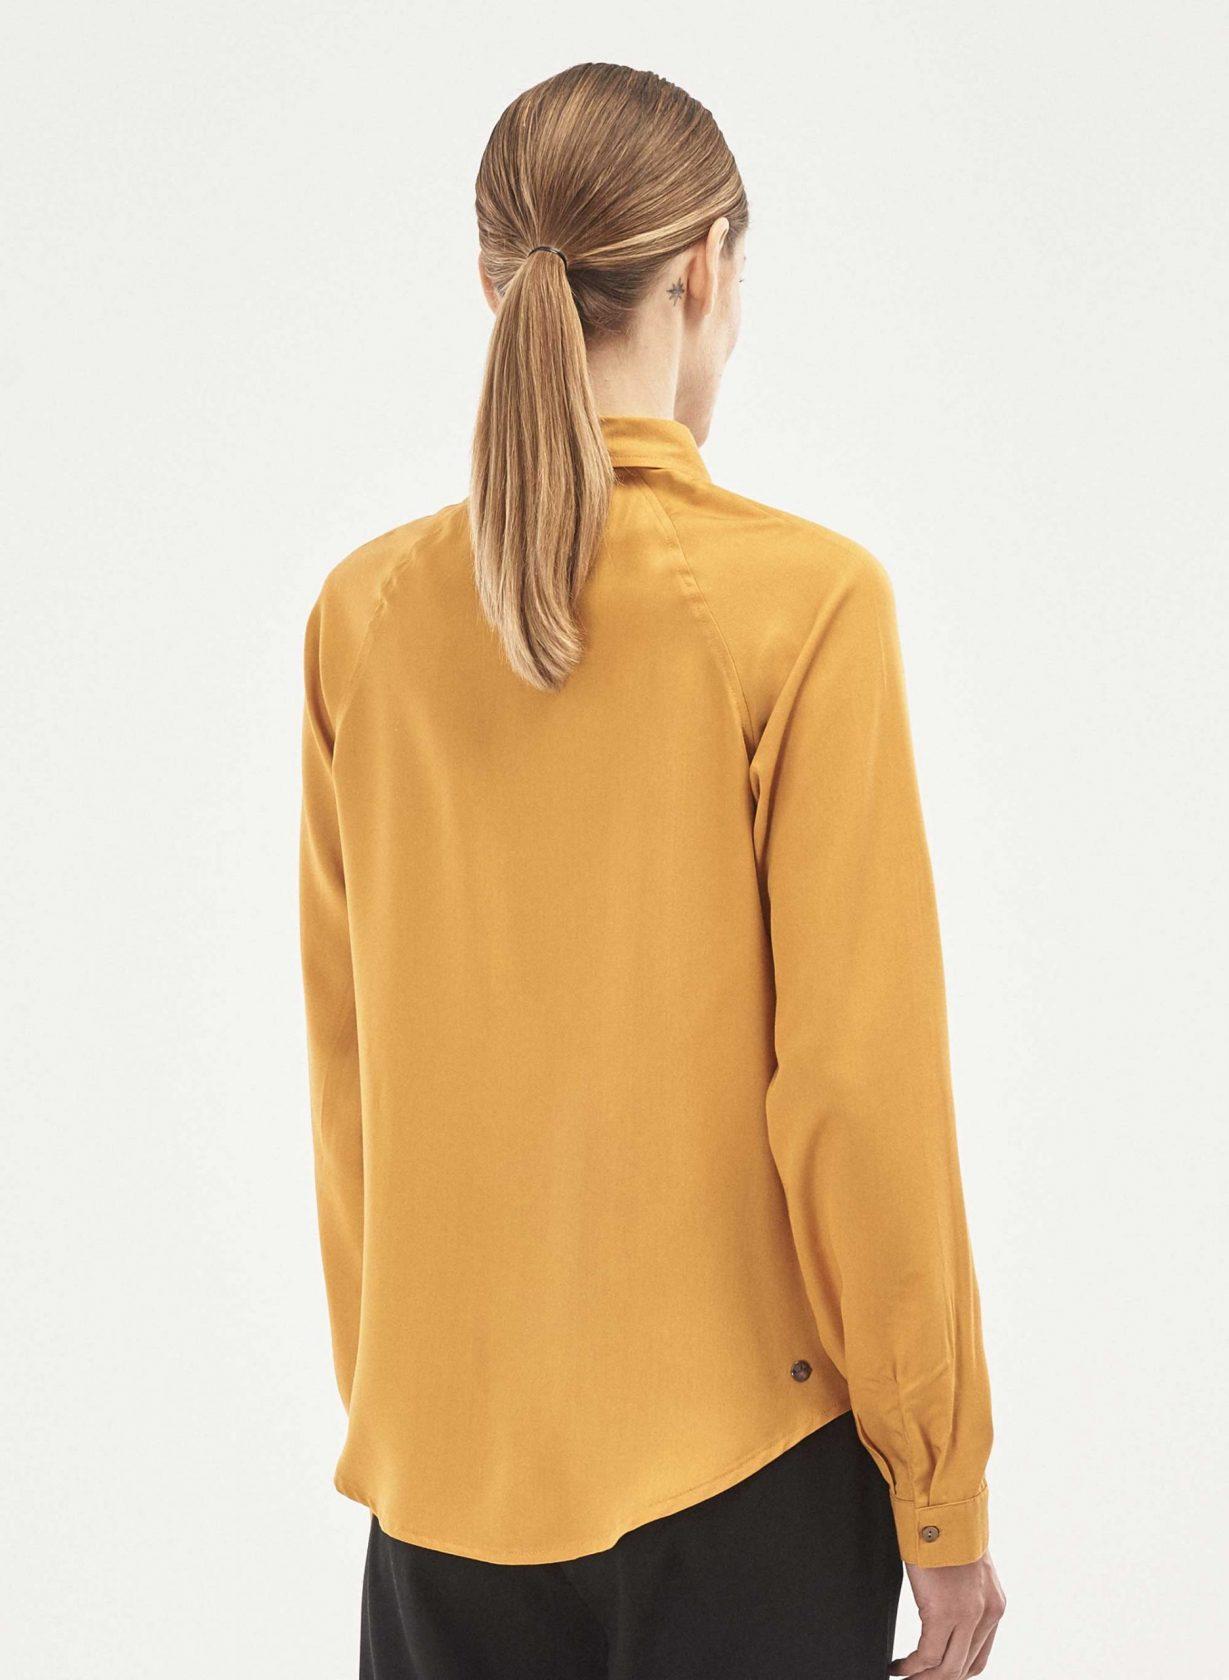 roberta organic fashion Organication Bluse Raglanärmel Kolibri Stickerei senfgelb 4 scaled